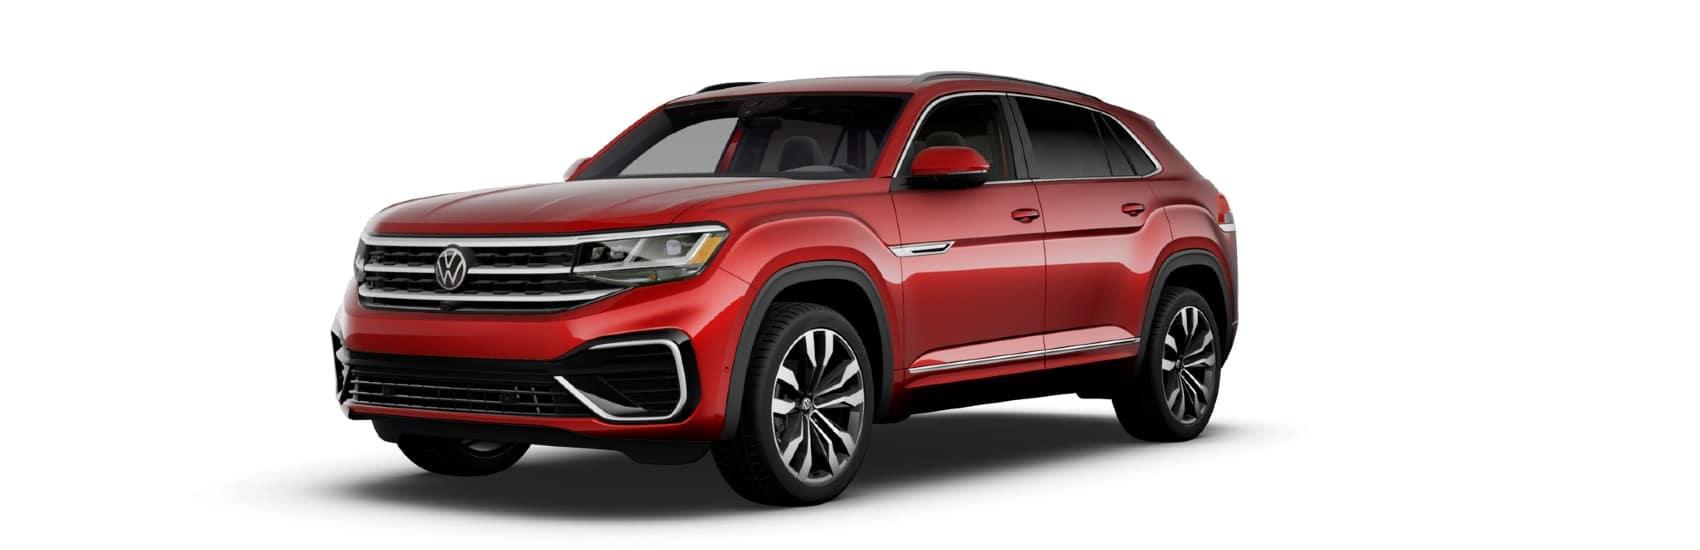 2021 Volkswagen Cross Sport C11 V6 SEL Premium